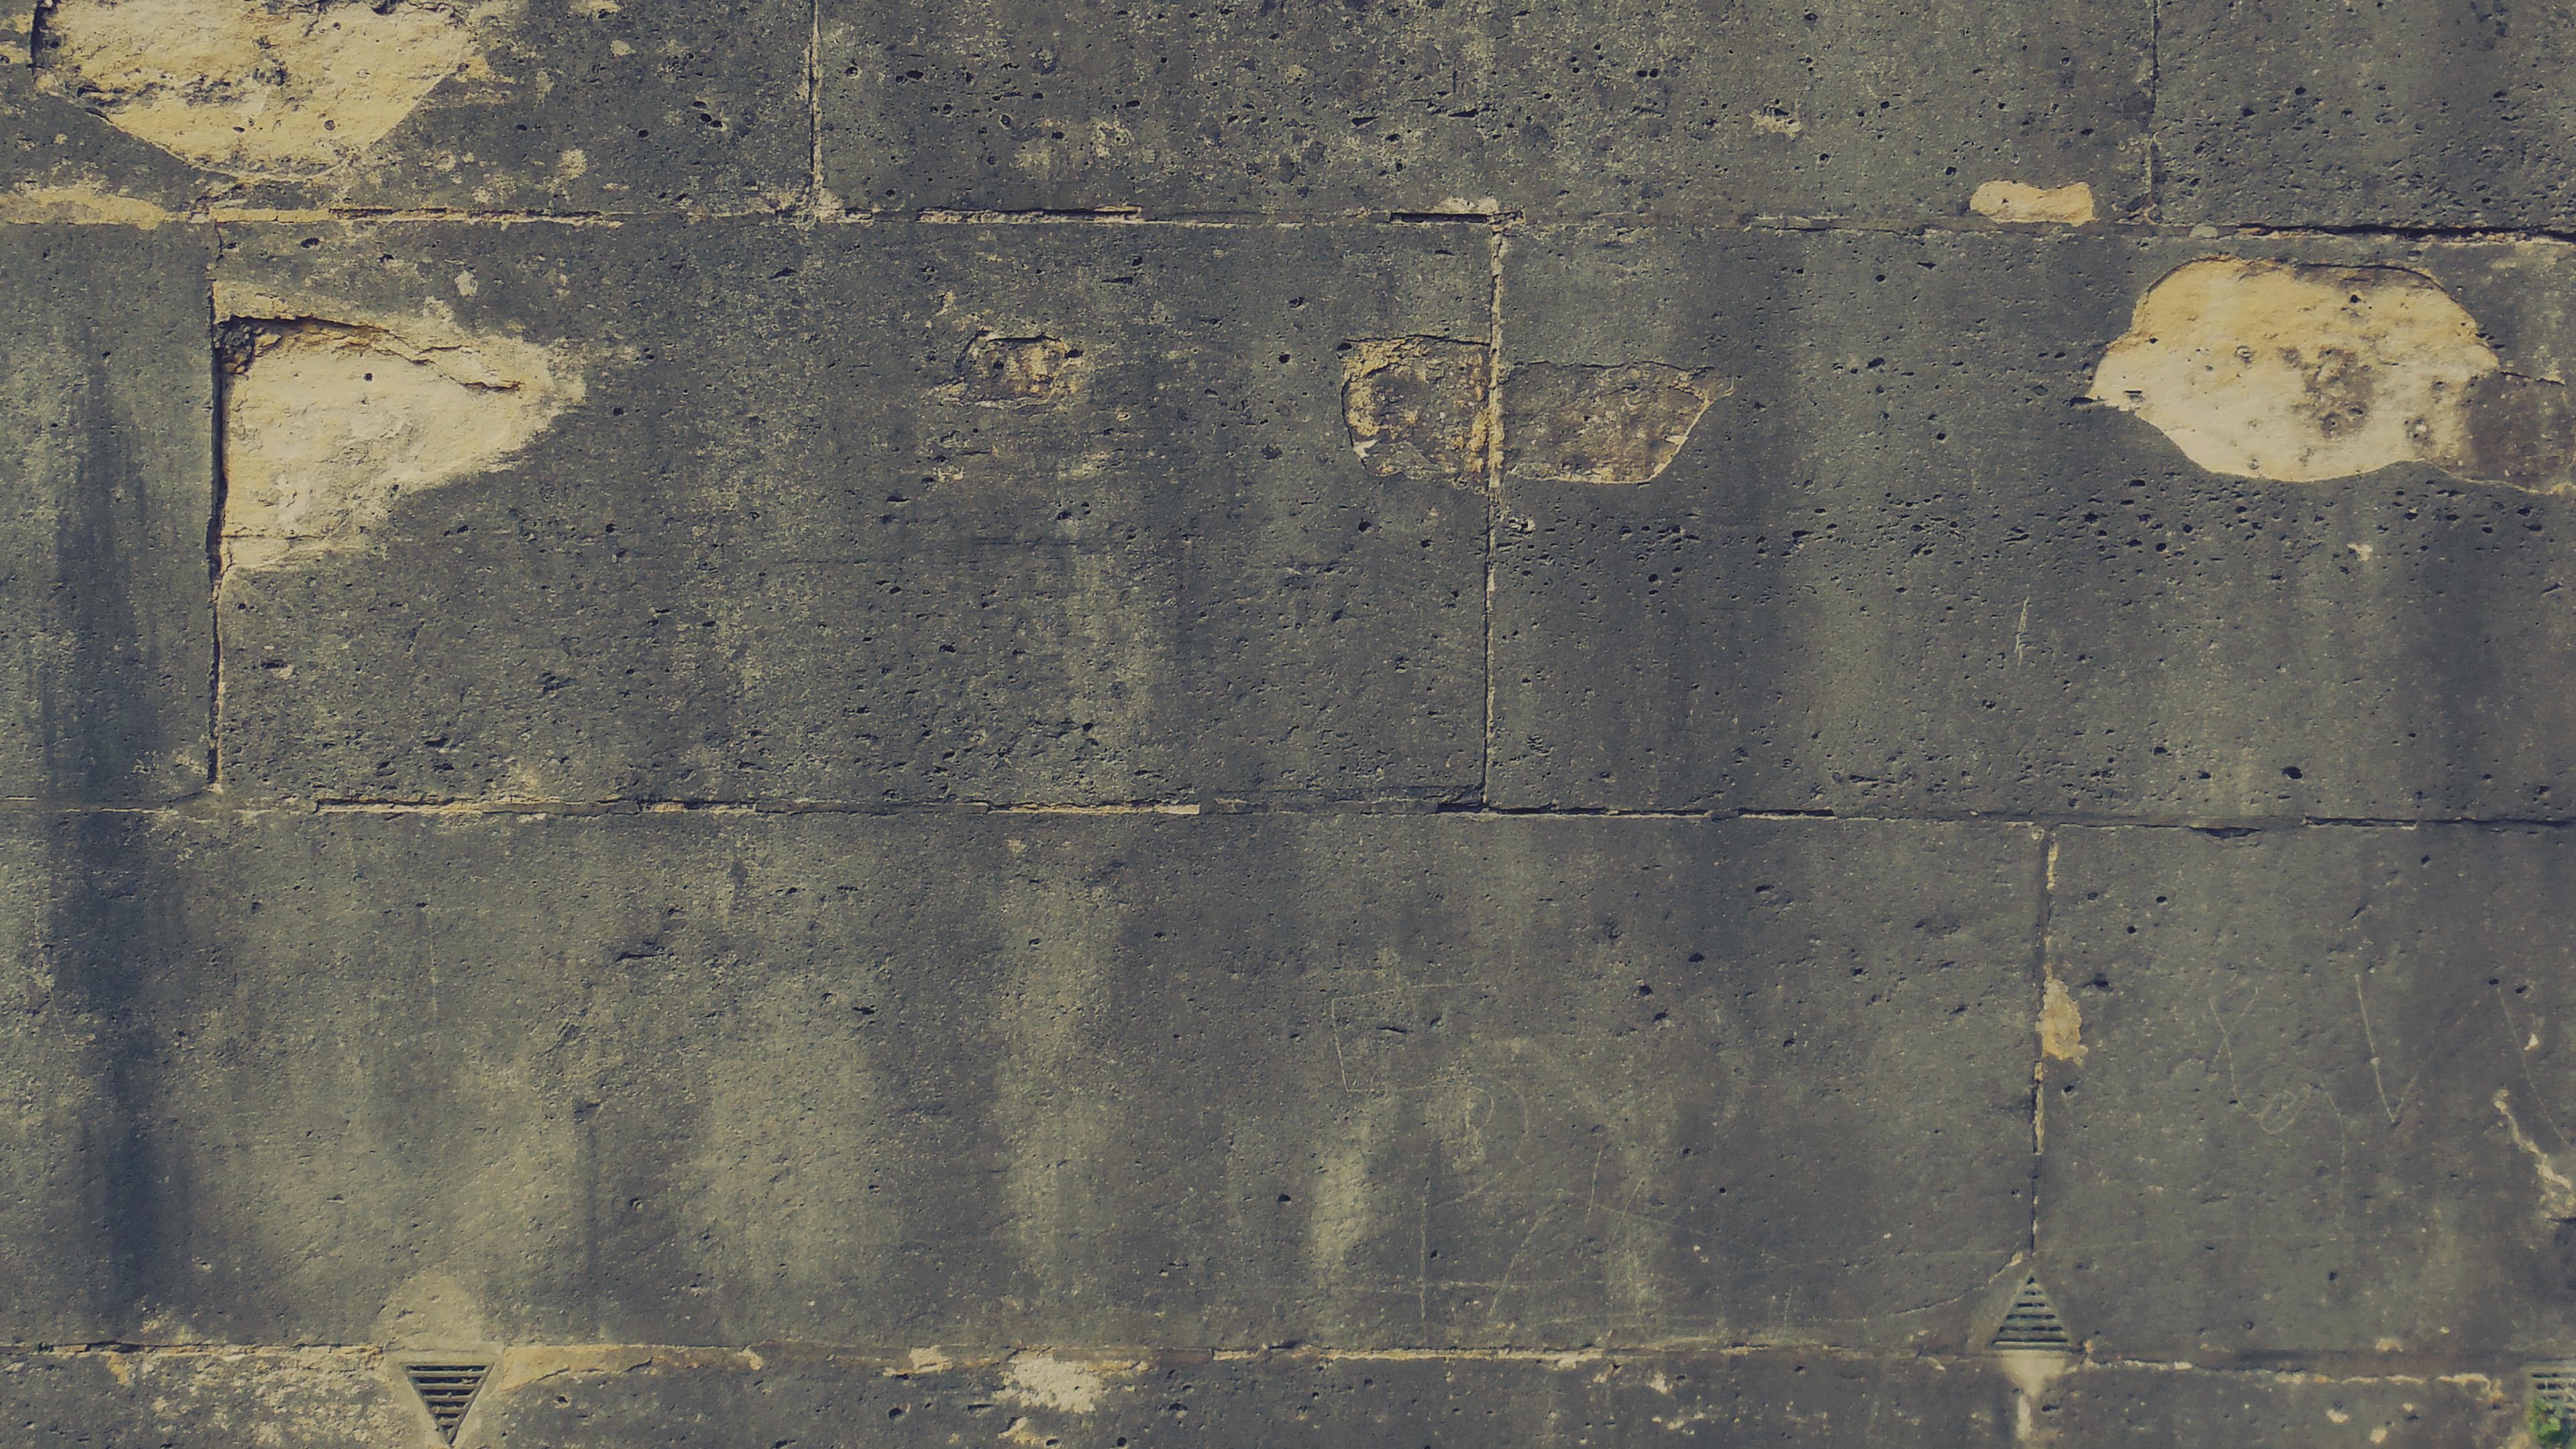 vj44-wall-brick-texture-tough-dark-pattern